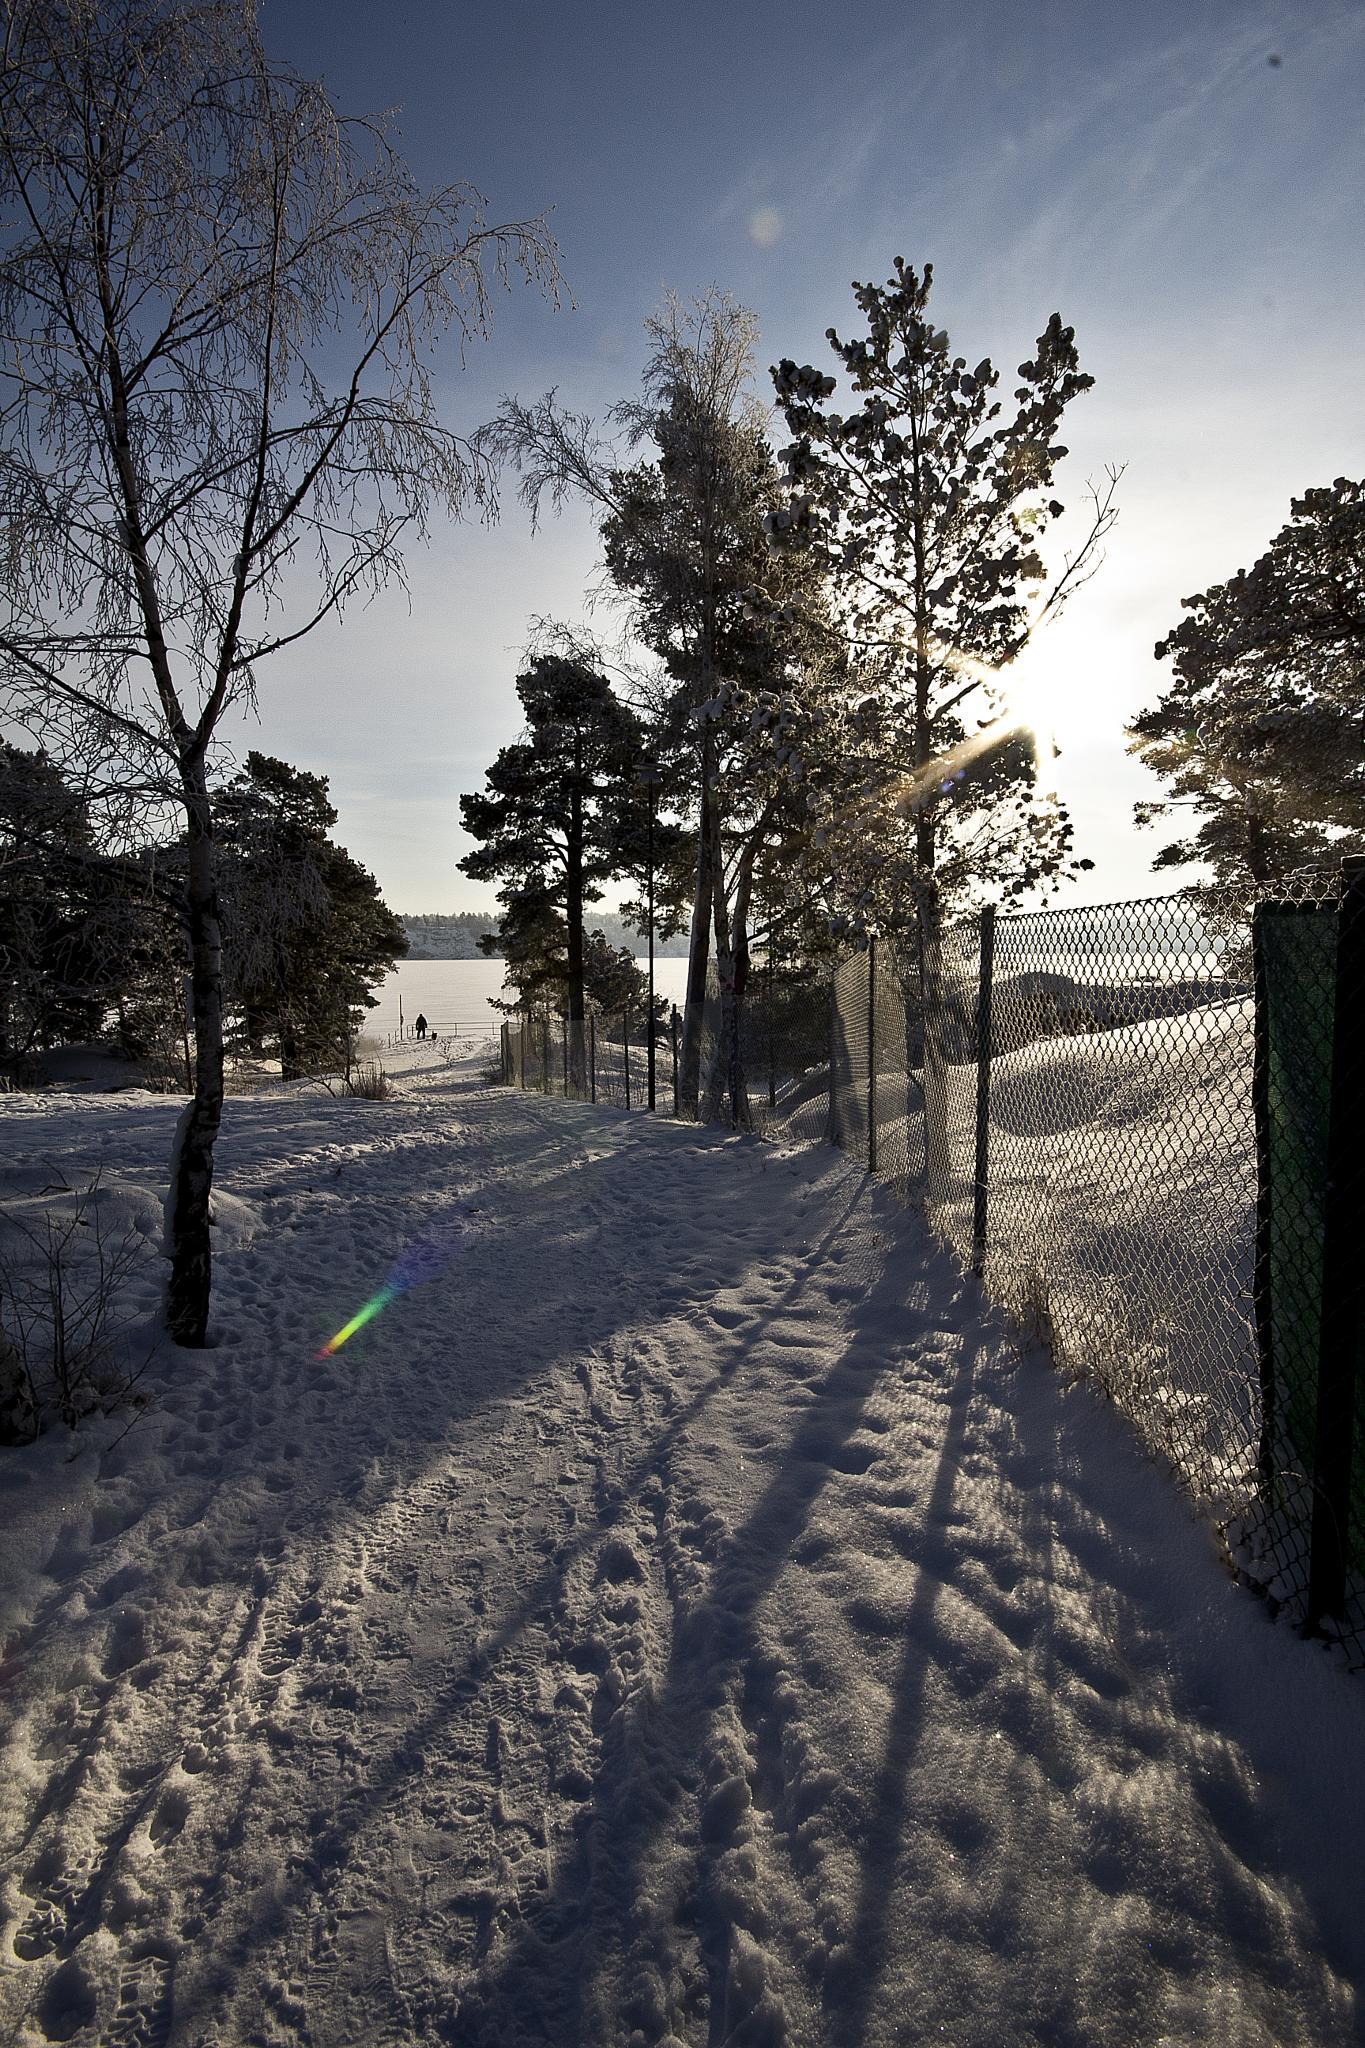 Winter @ Saltsjöbaden by gerry.askefalk